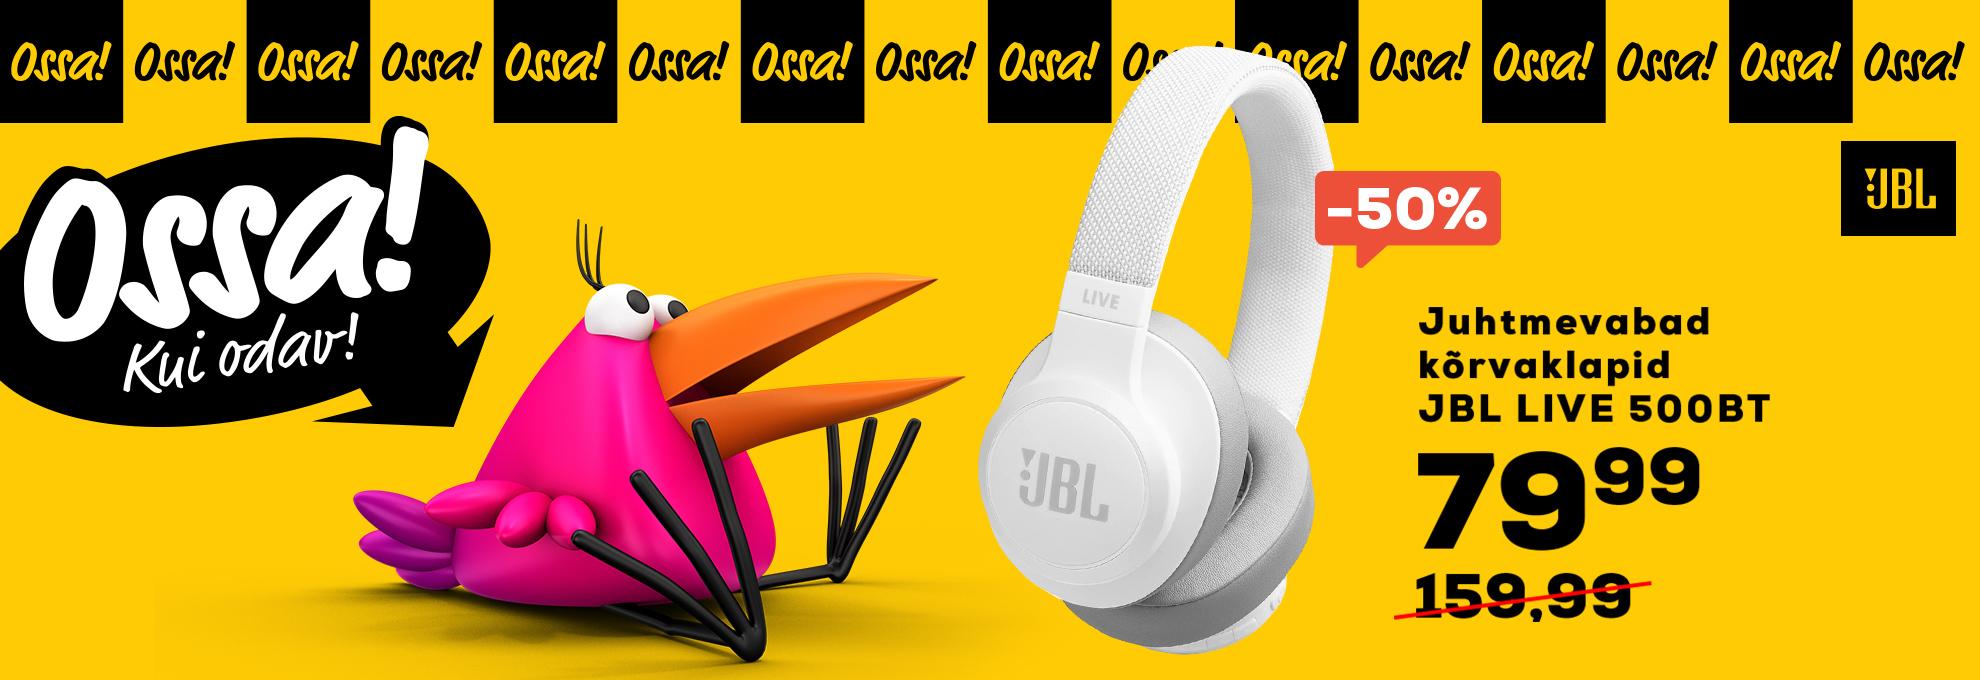 Ossa JBL Juhtmevabad kõrvaklapid JBL LIVE 500BT